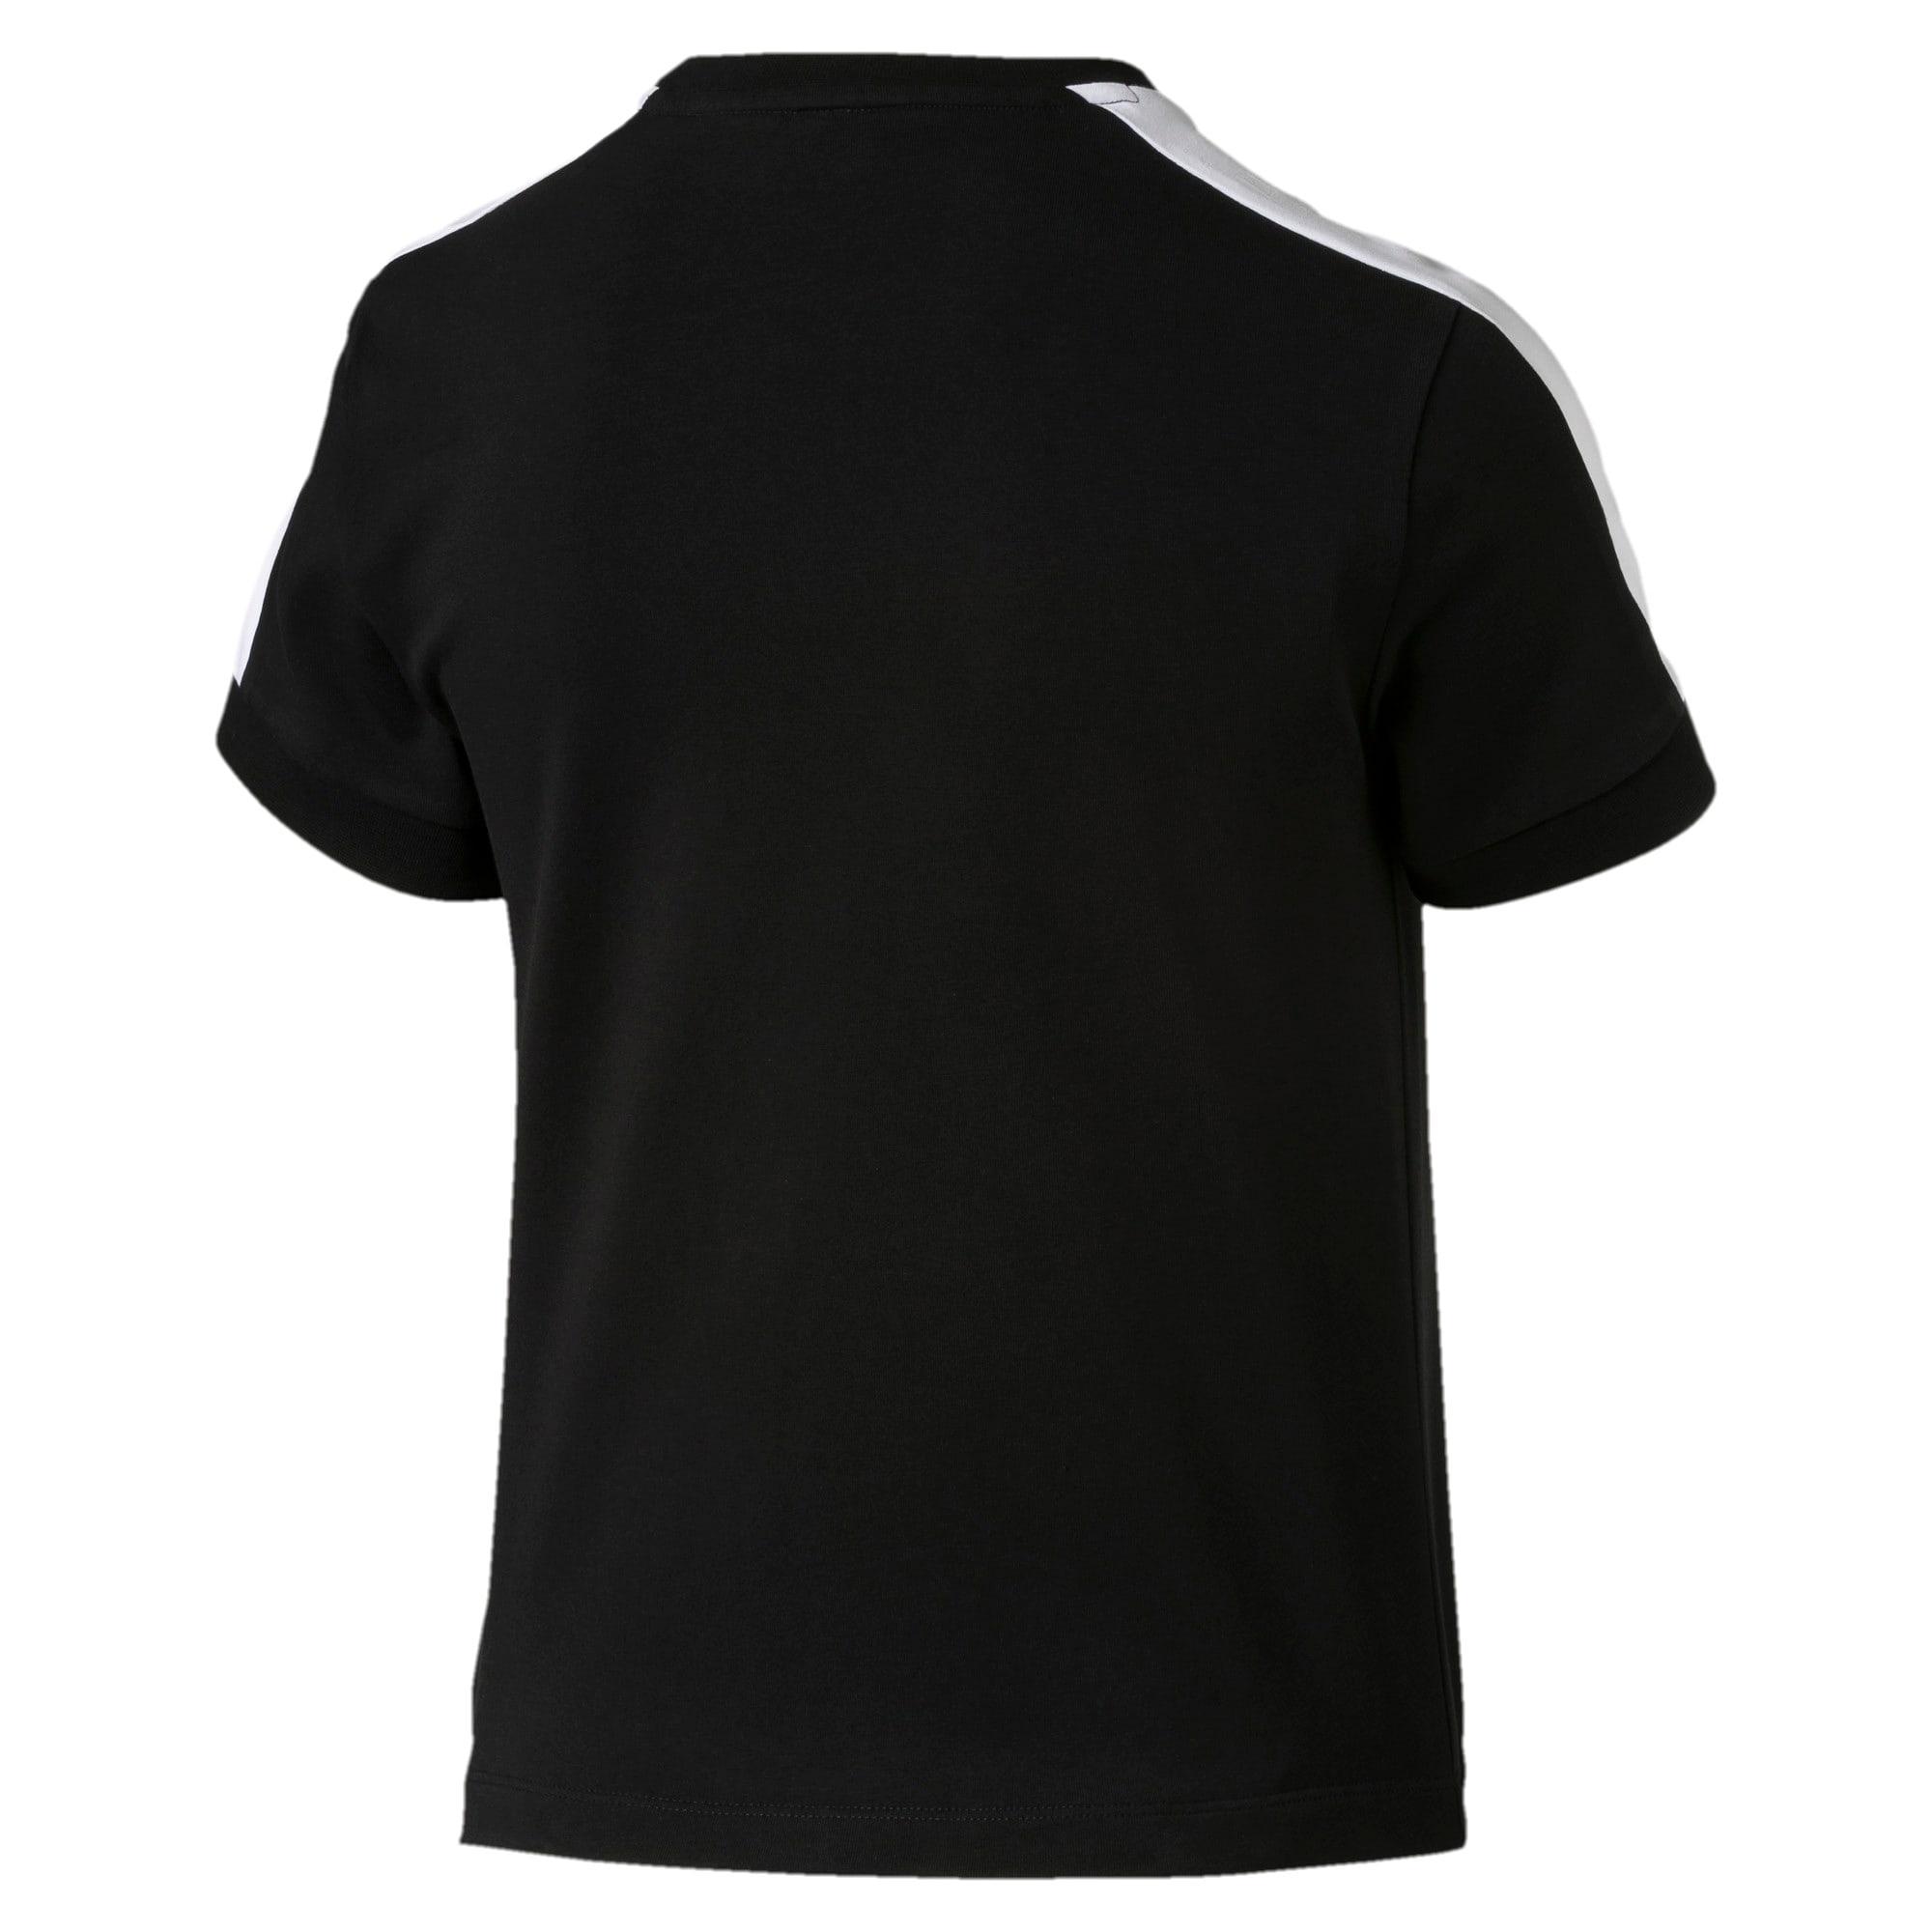 Thumbnail 4 of CLASSICS タイト ウィメンズ SS Tシャツ 半袖, Cotton Black-puma white, medium-JPN